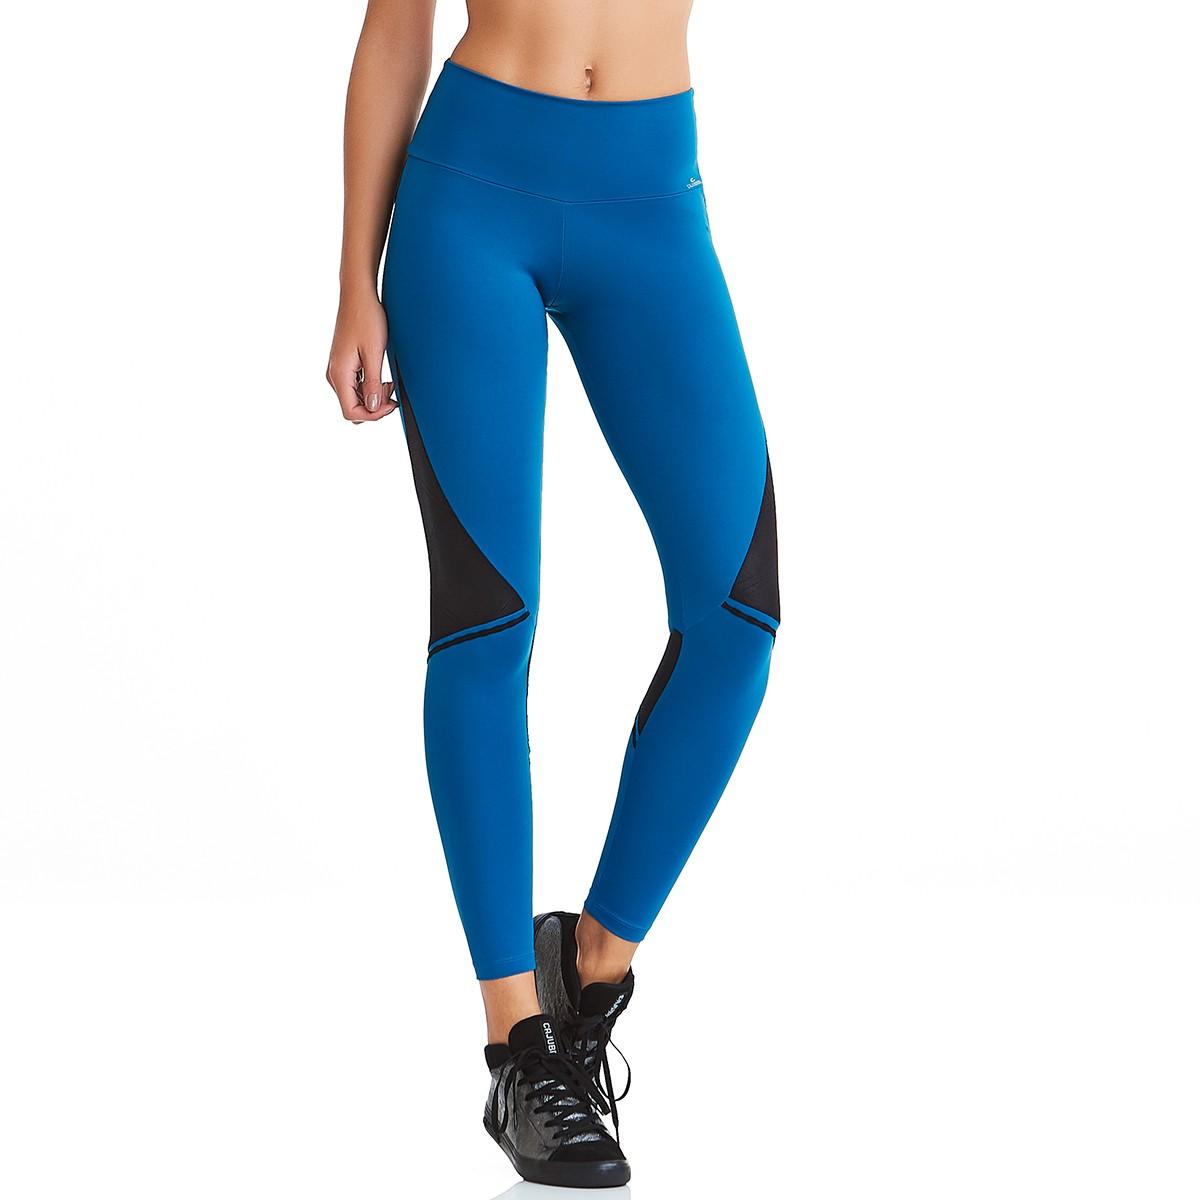 Legging Emana Urban Azul CAJUBRASIL Activewear